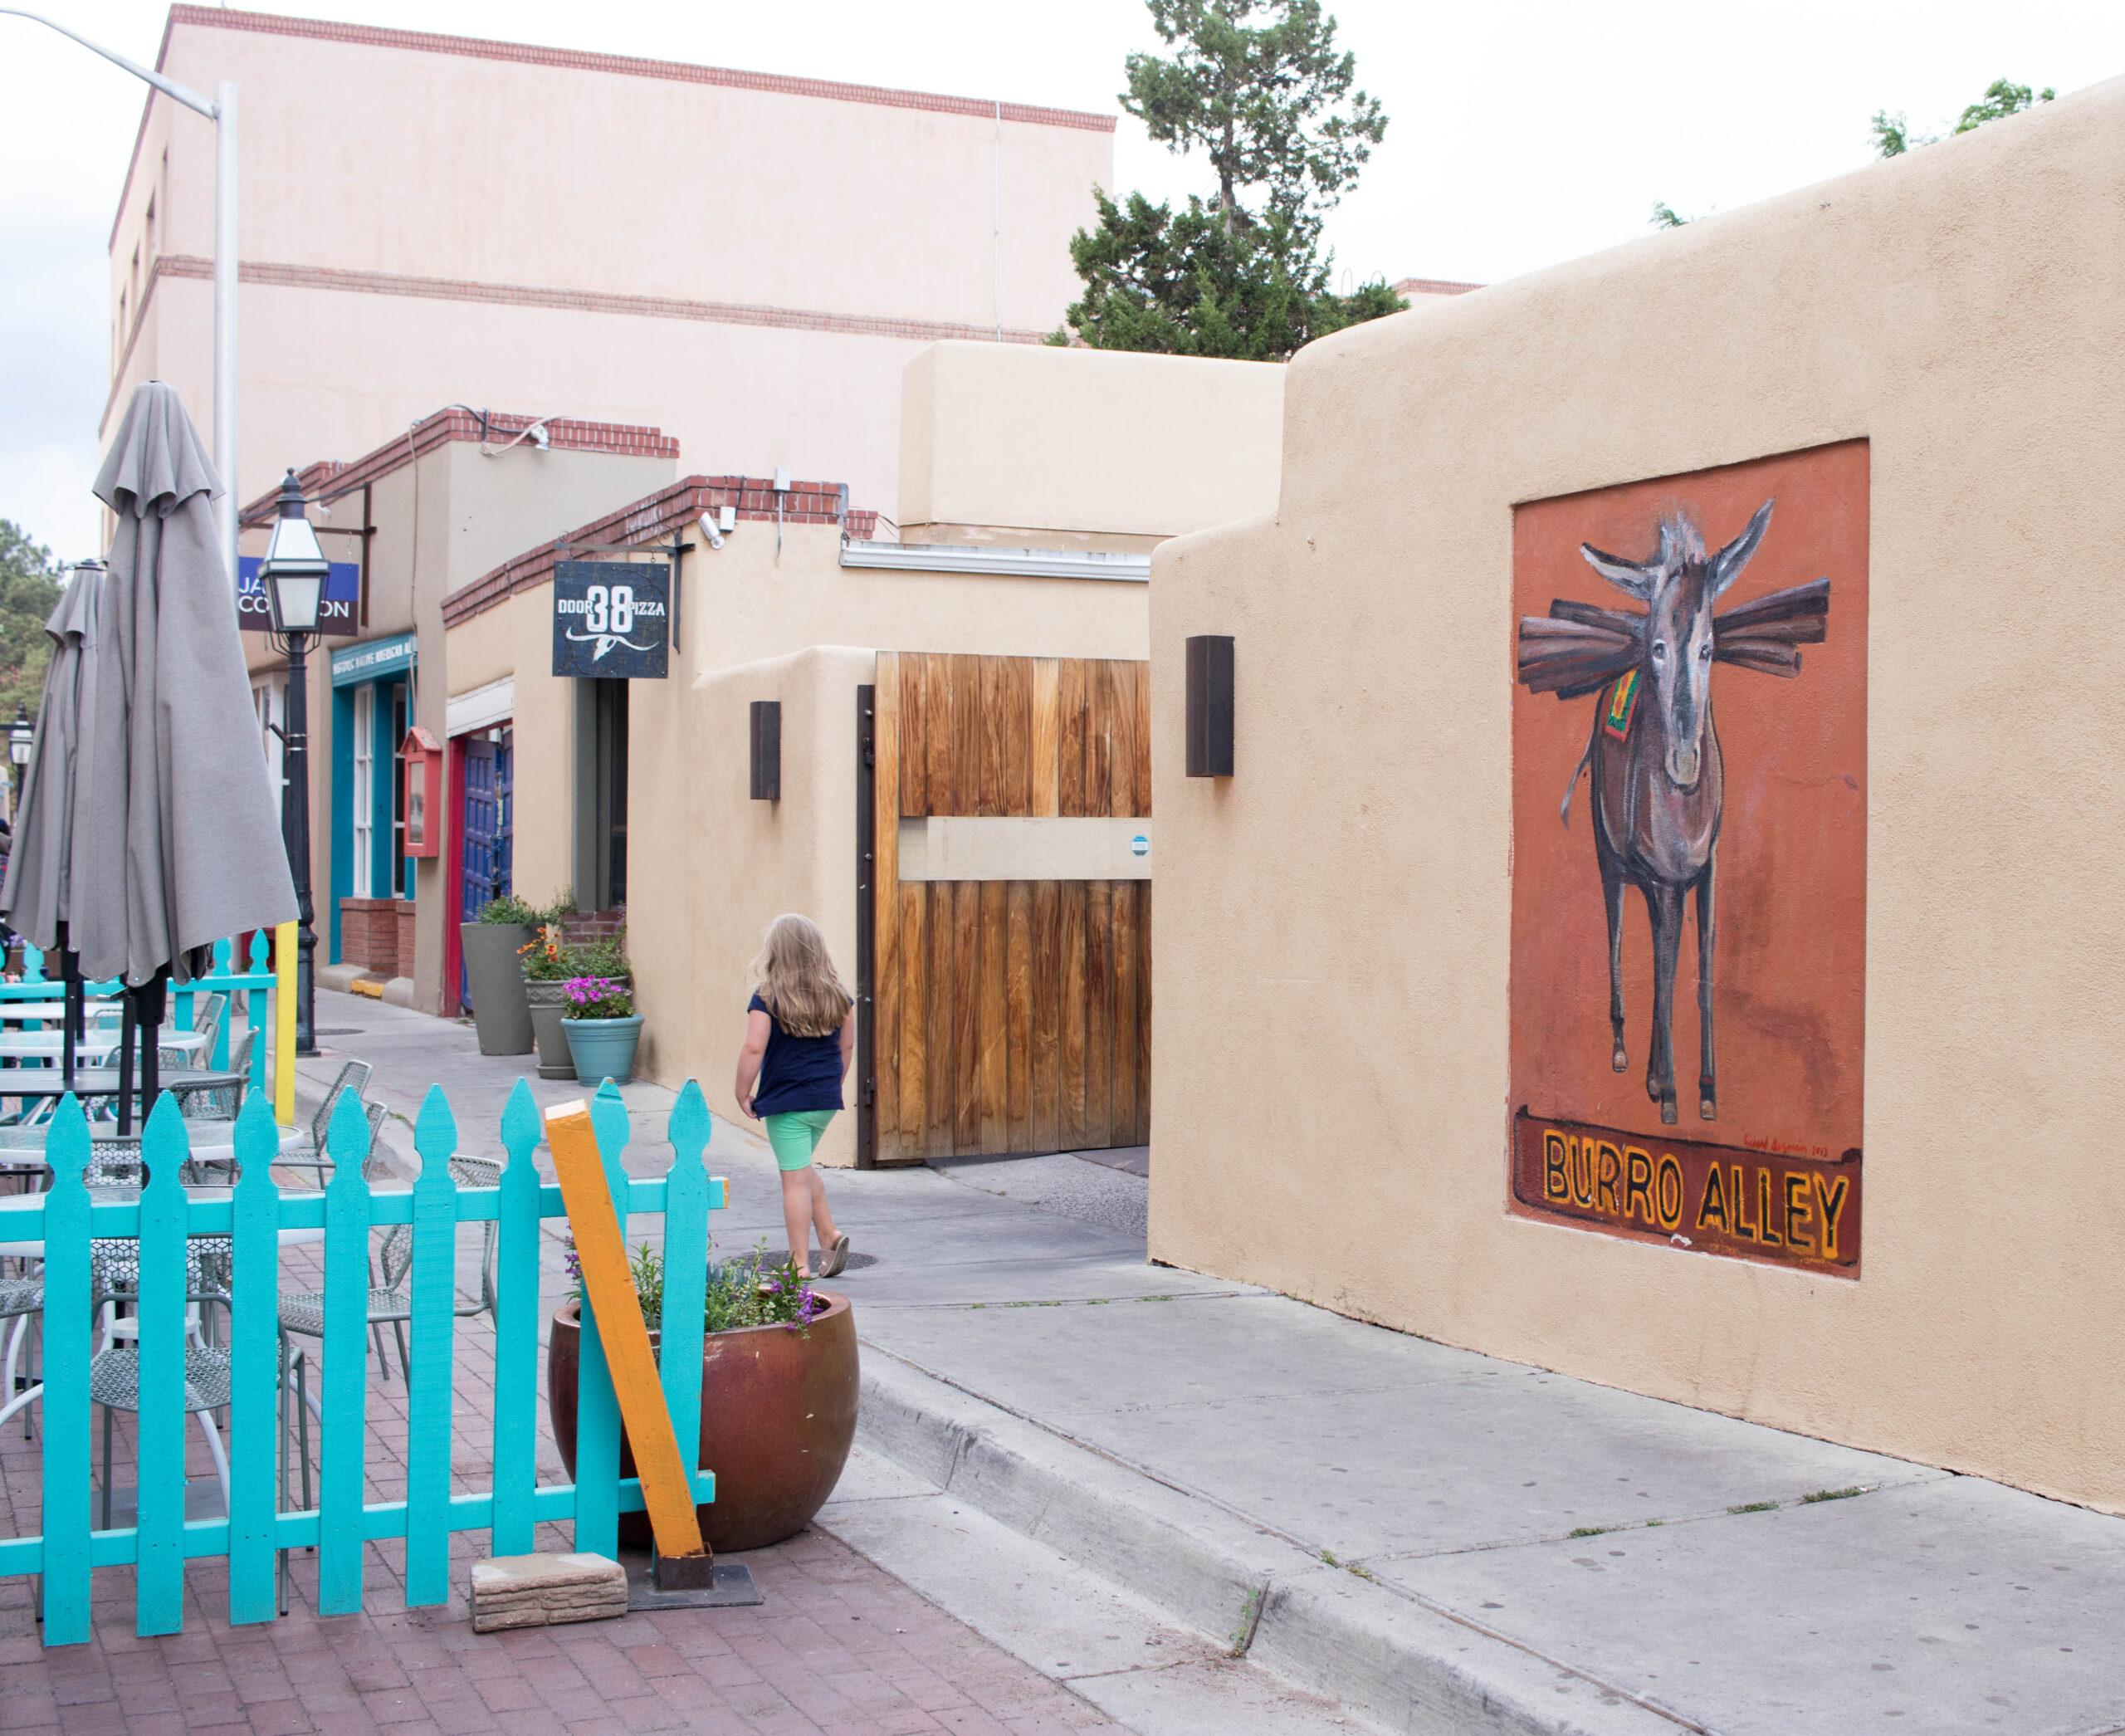 burro alley Santa Fe New Mexico #santafe #newmexico #newmexicotrue